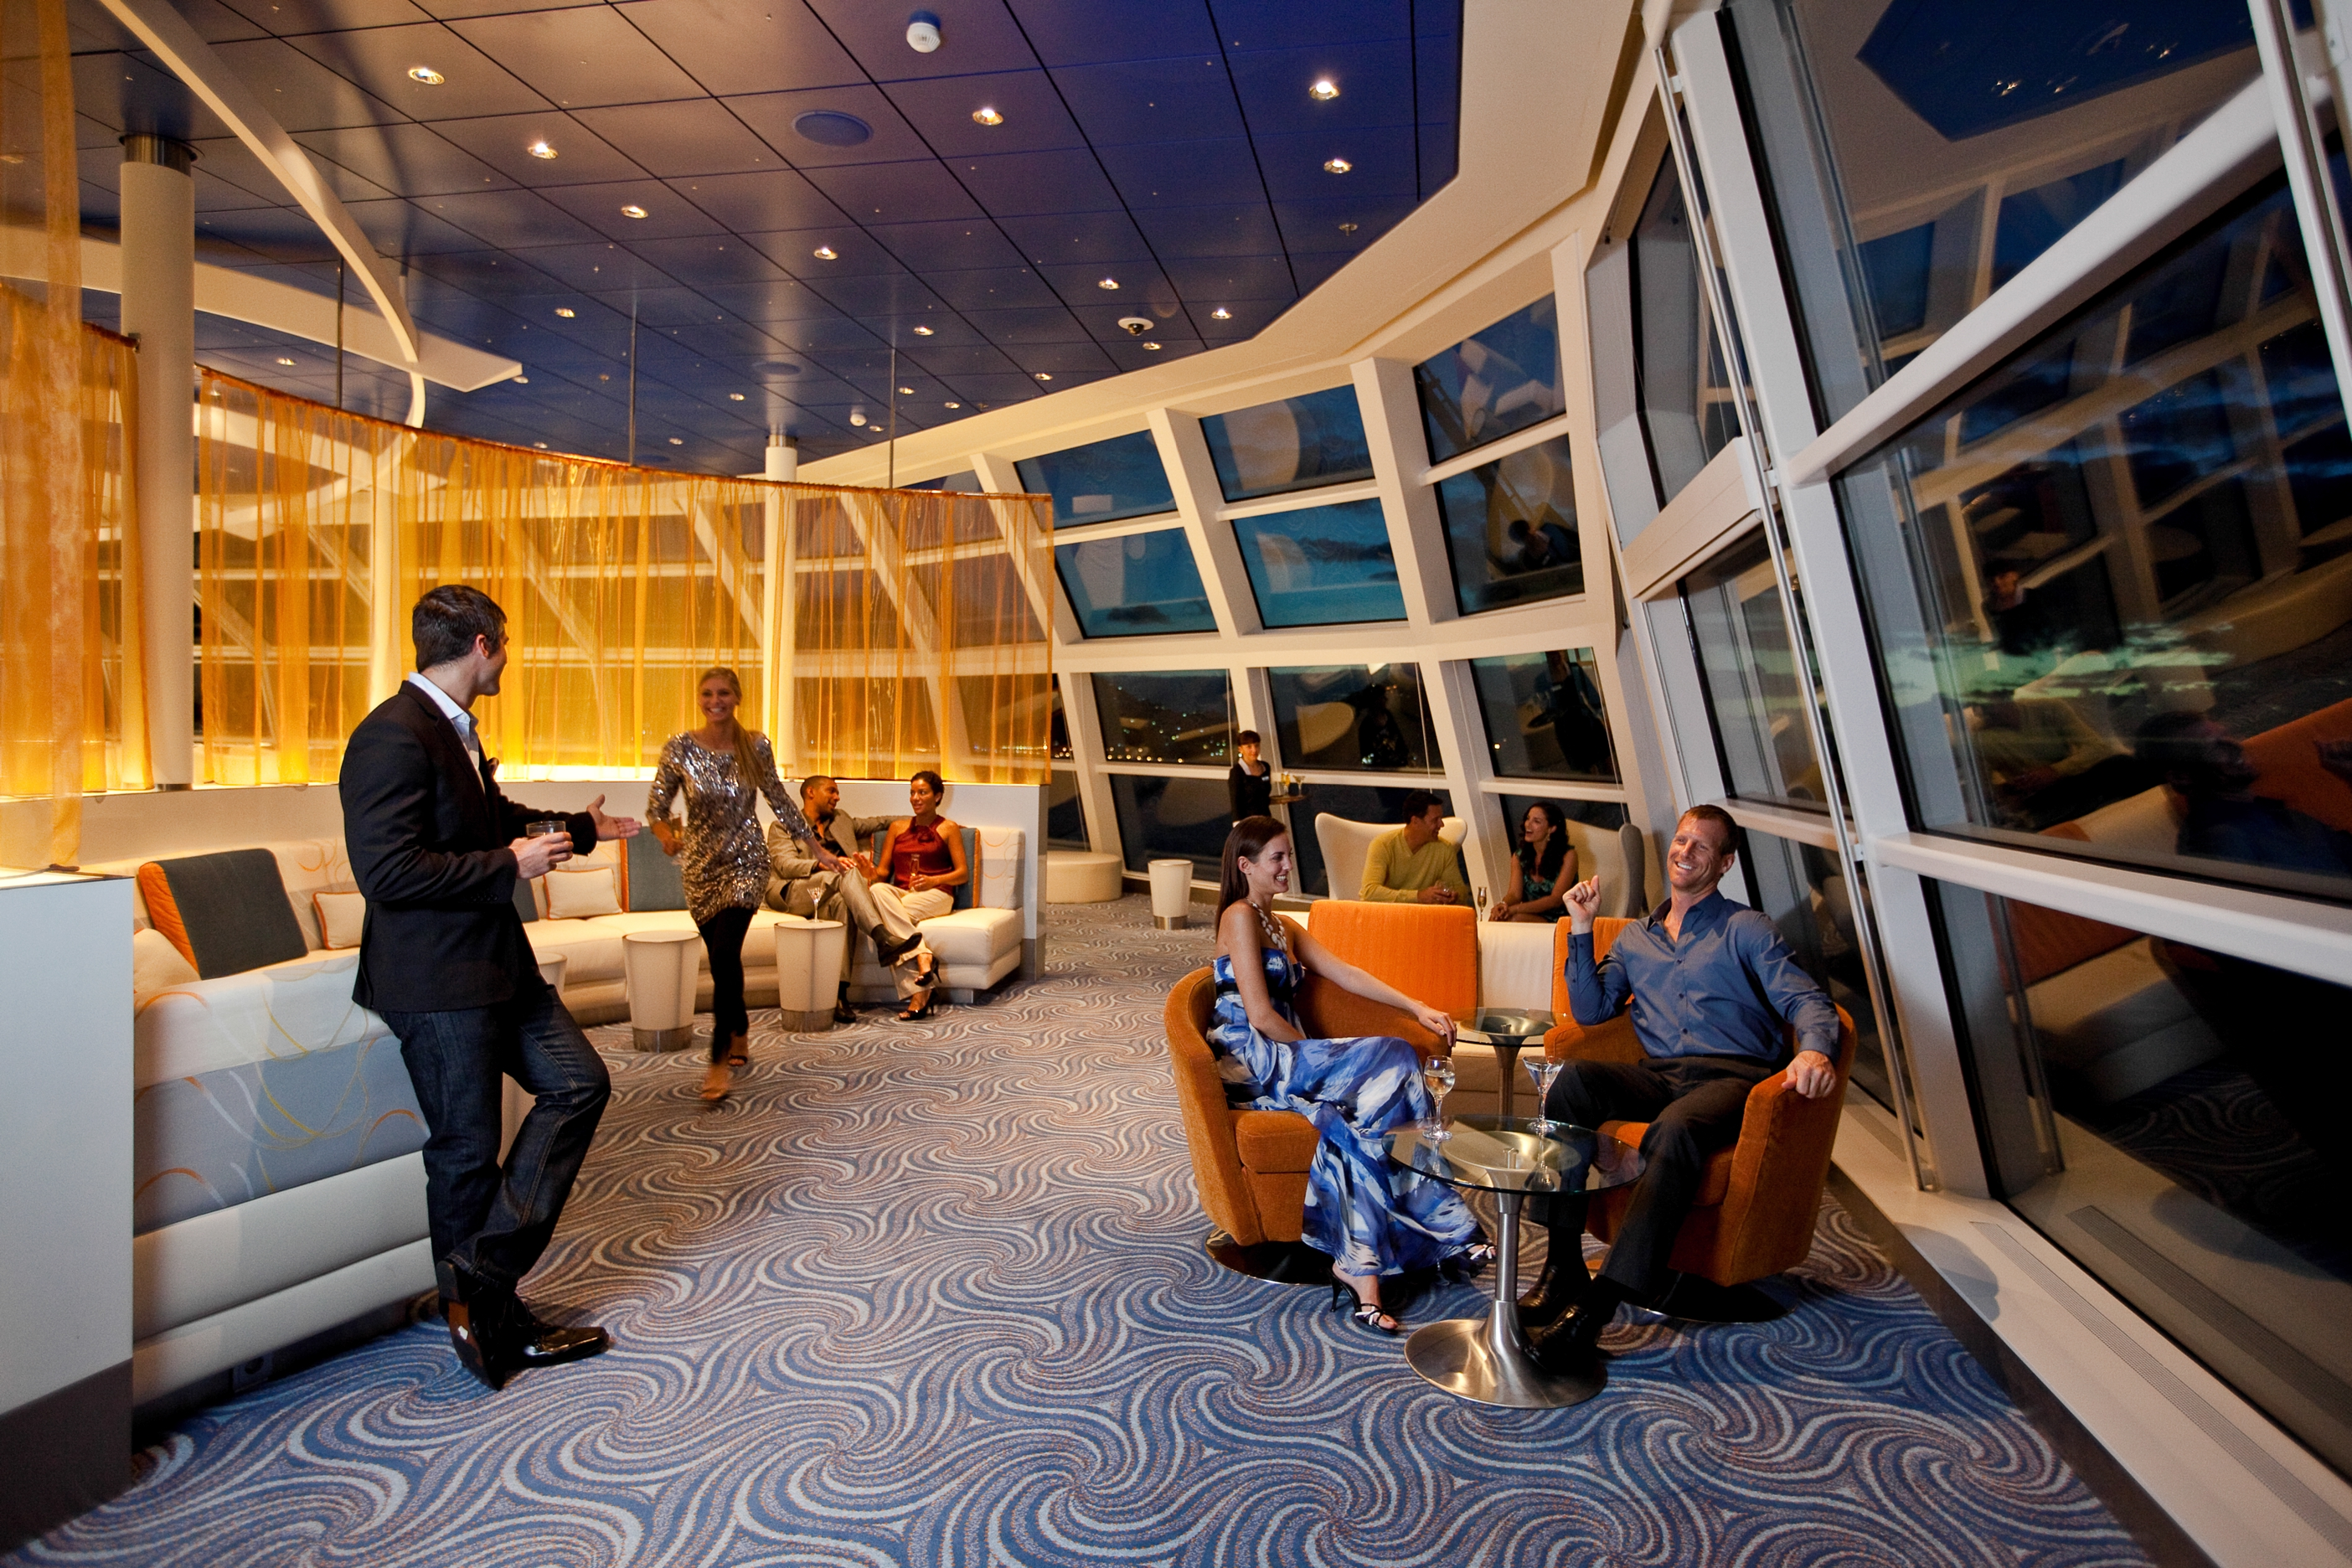 celebrity cruises celebrity eclipse sky observation lounge.jpg